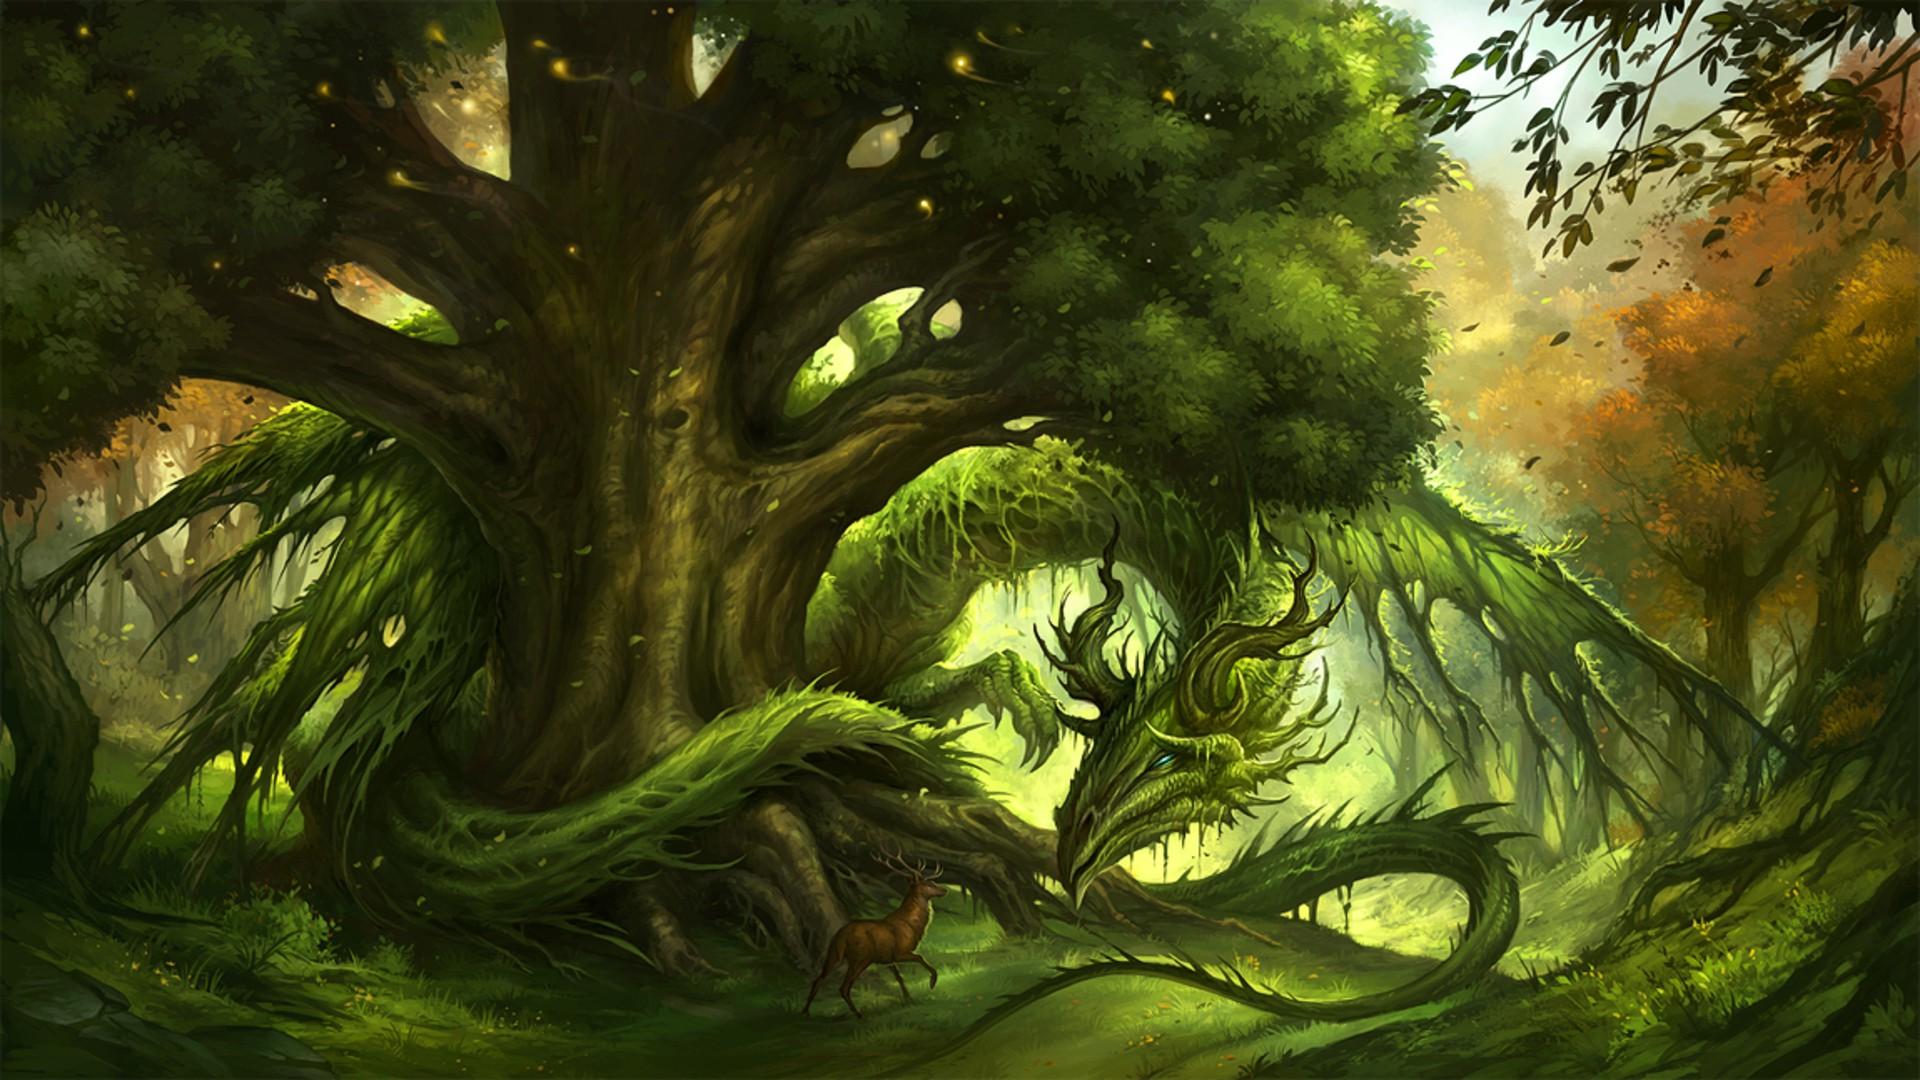 начале перестройки картинки с драконами на природе посещение петербуржцами